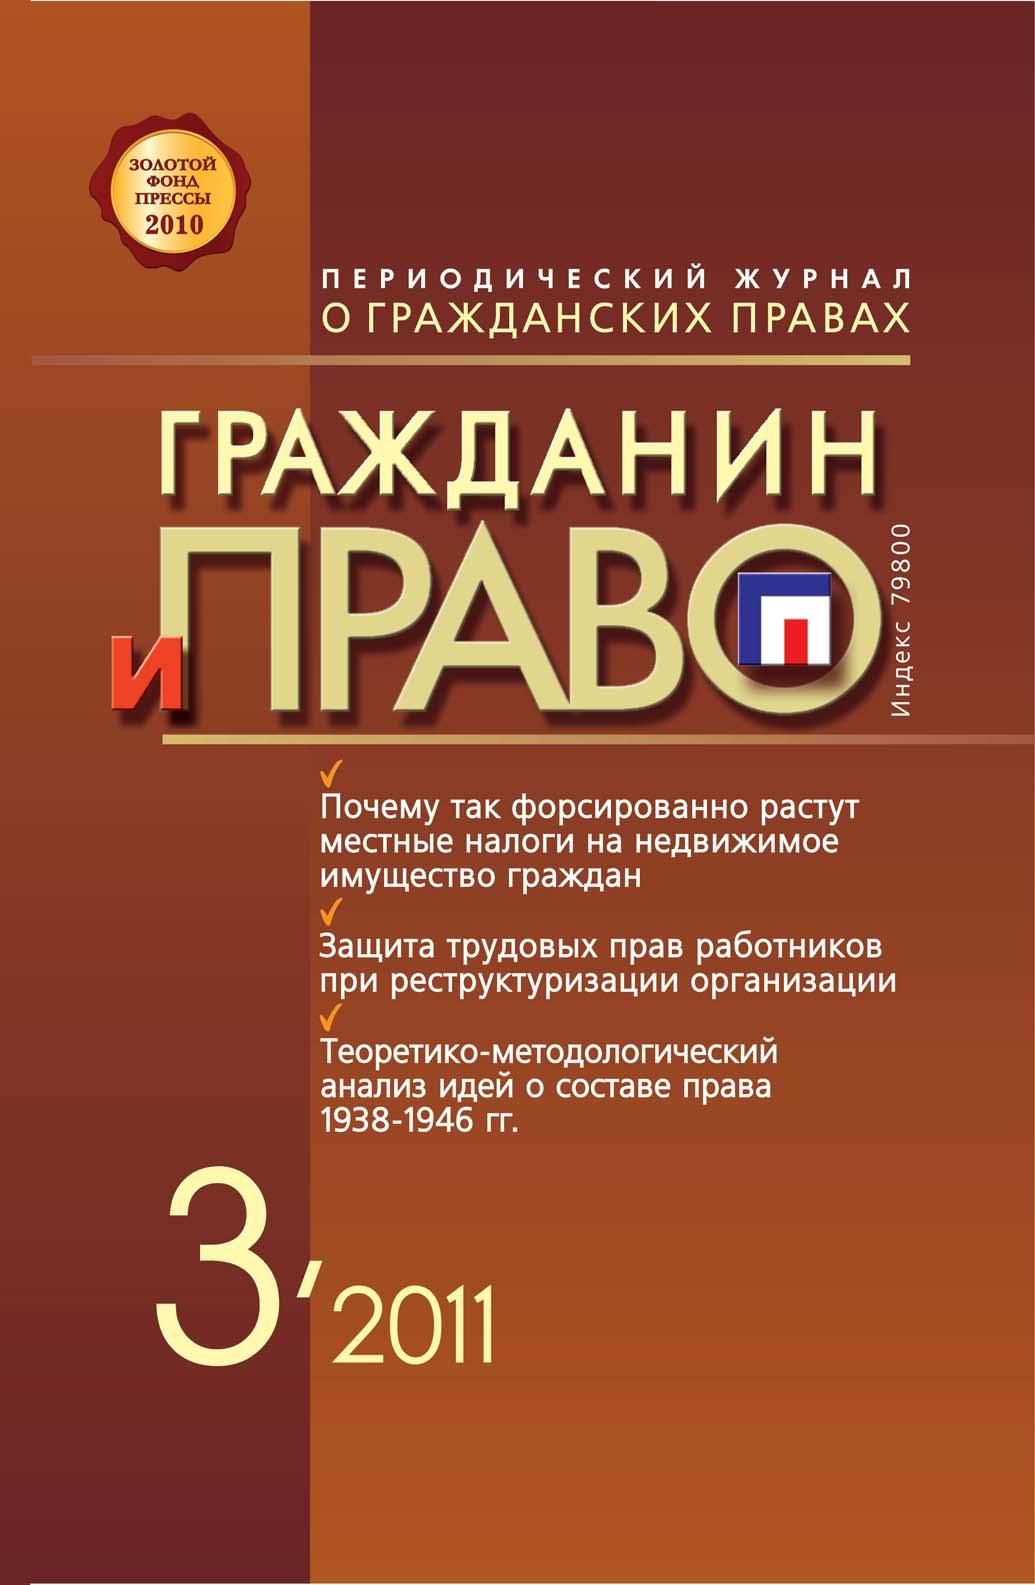 Гражданин и право №03/2011